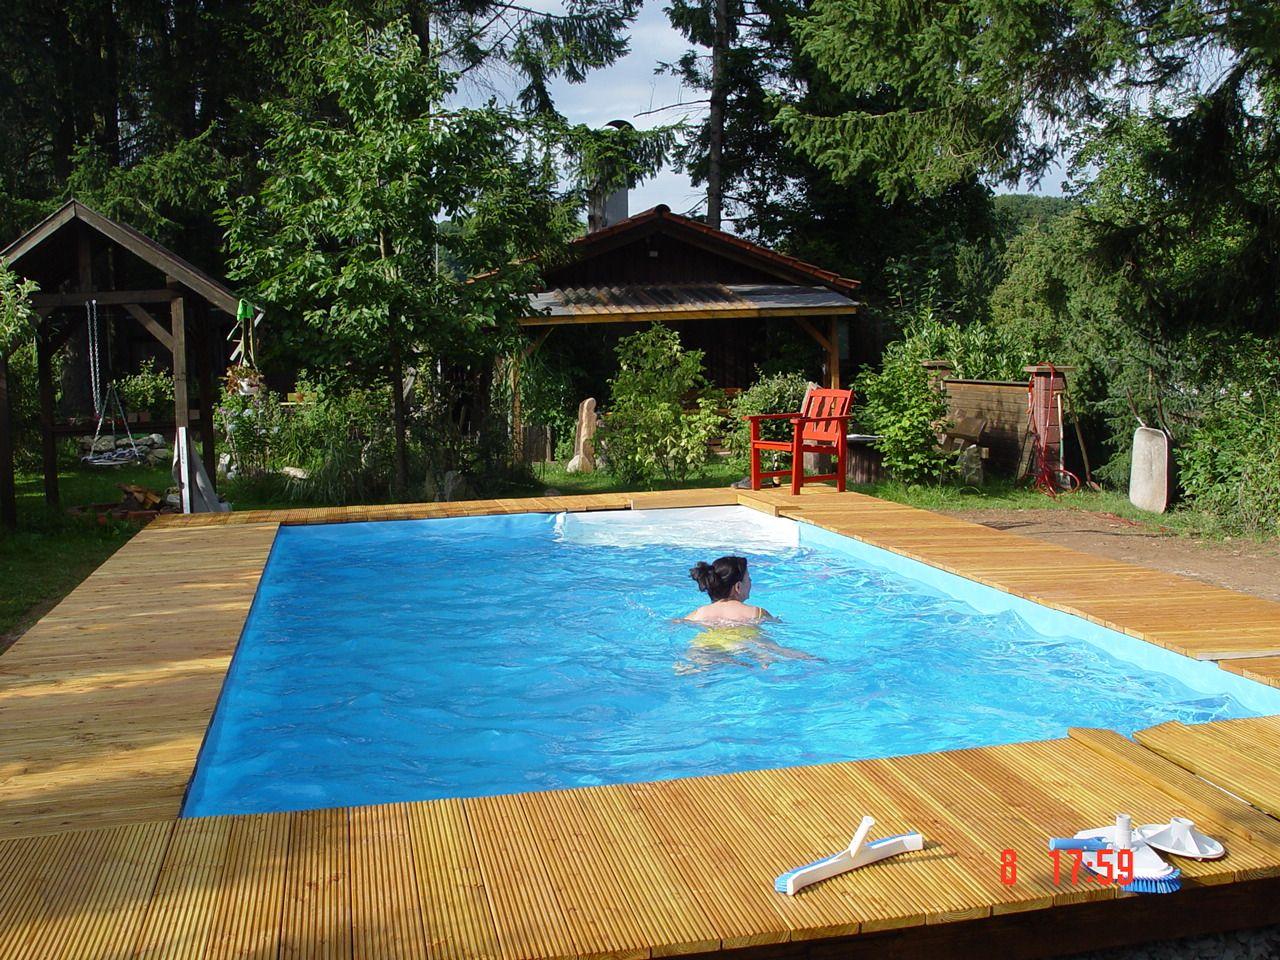 Pool mauern fertig inspirationen pinterest teich for Ovaler pool garten